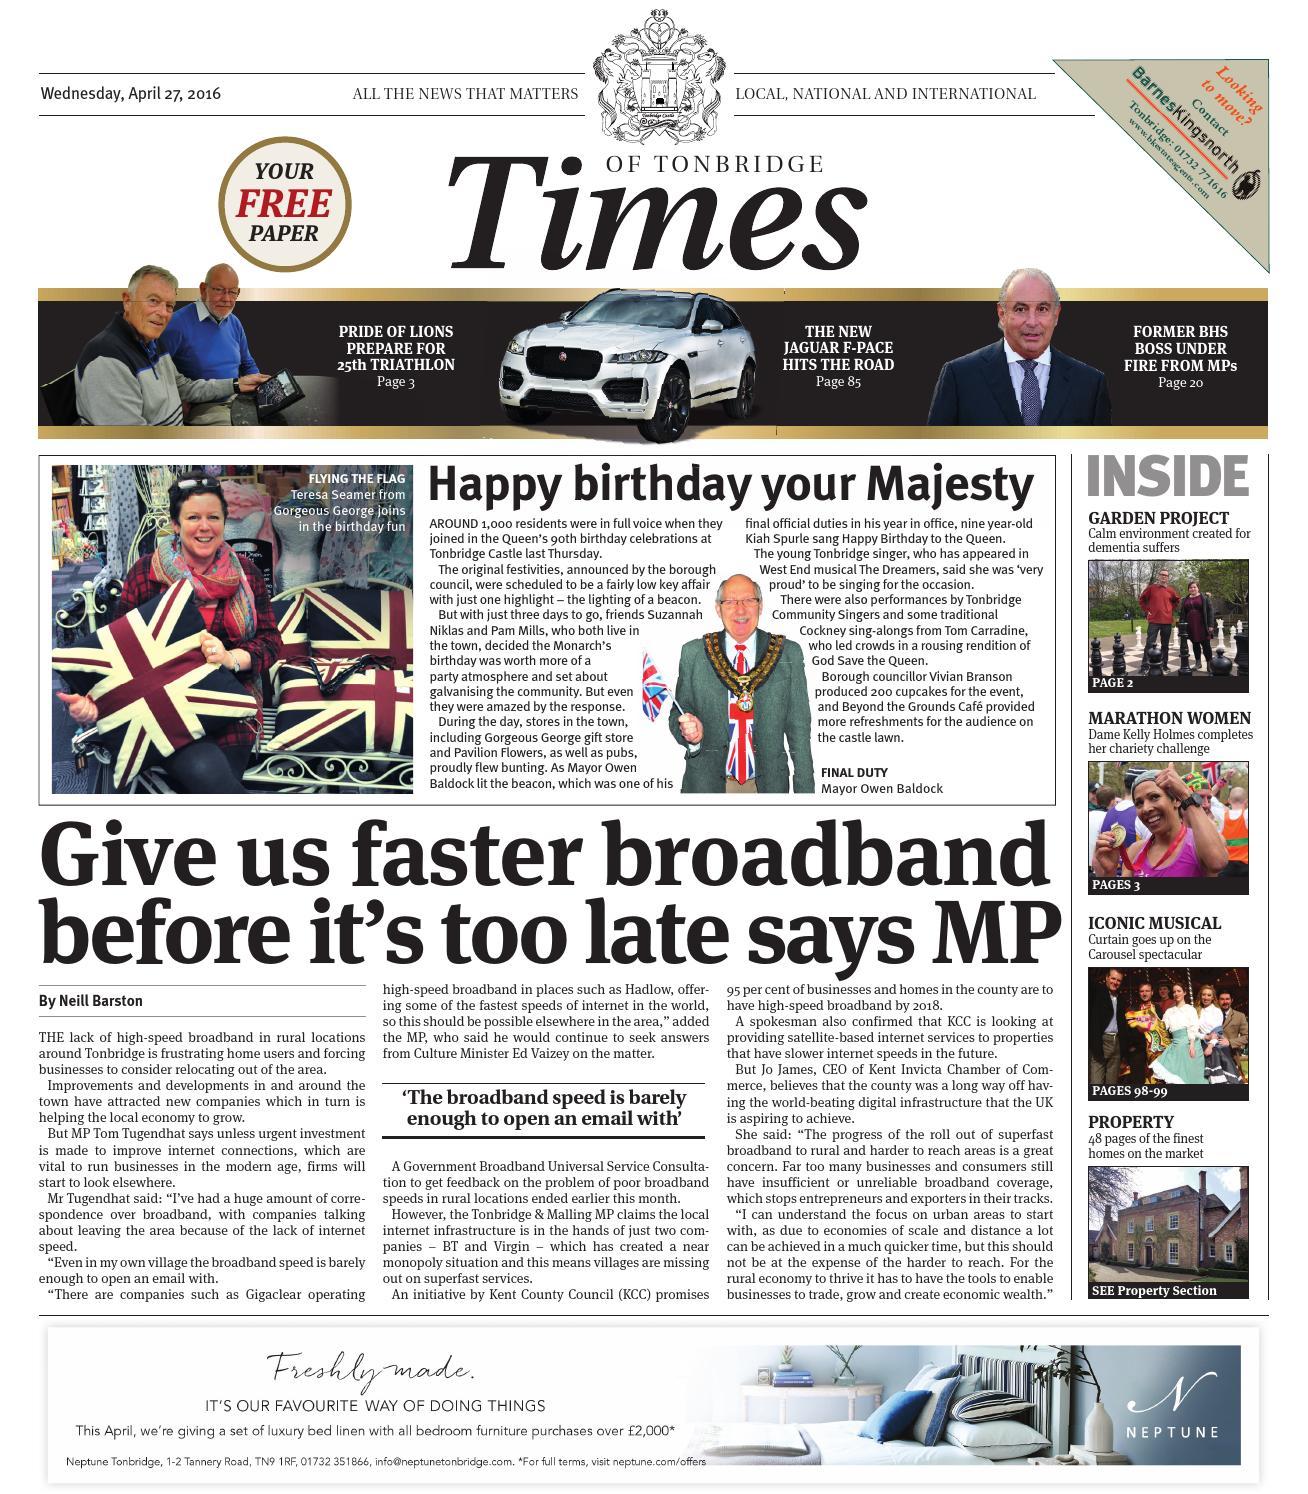 ea4415a2e62 Times of Tonbridge 27th April 2016 by One Media - issuu